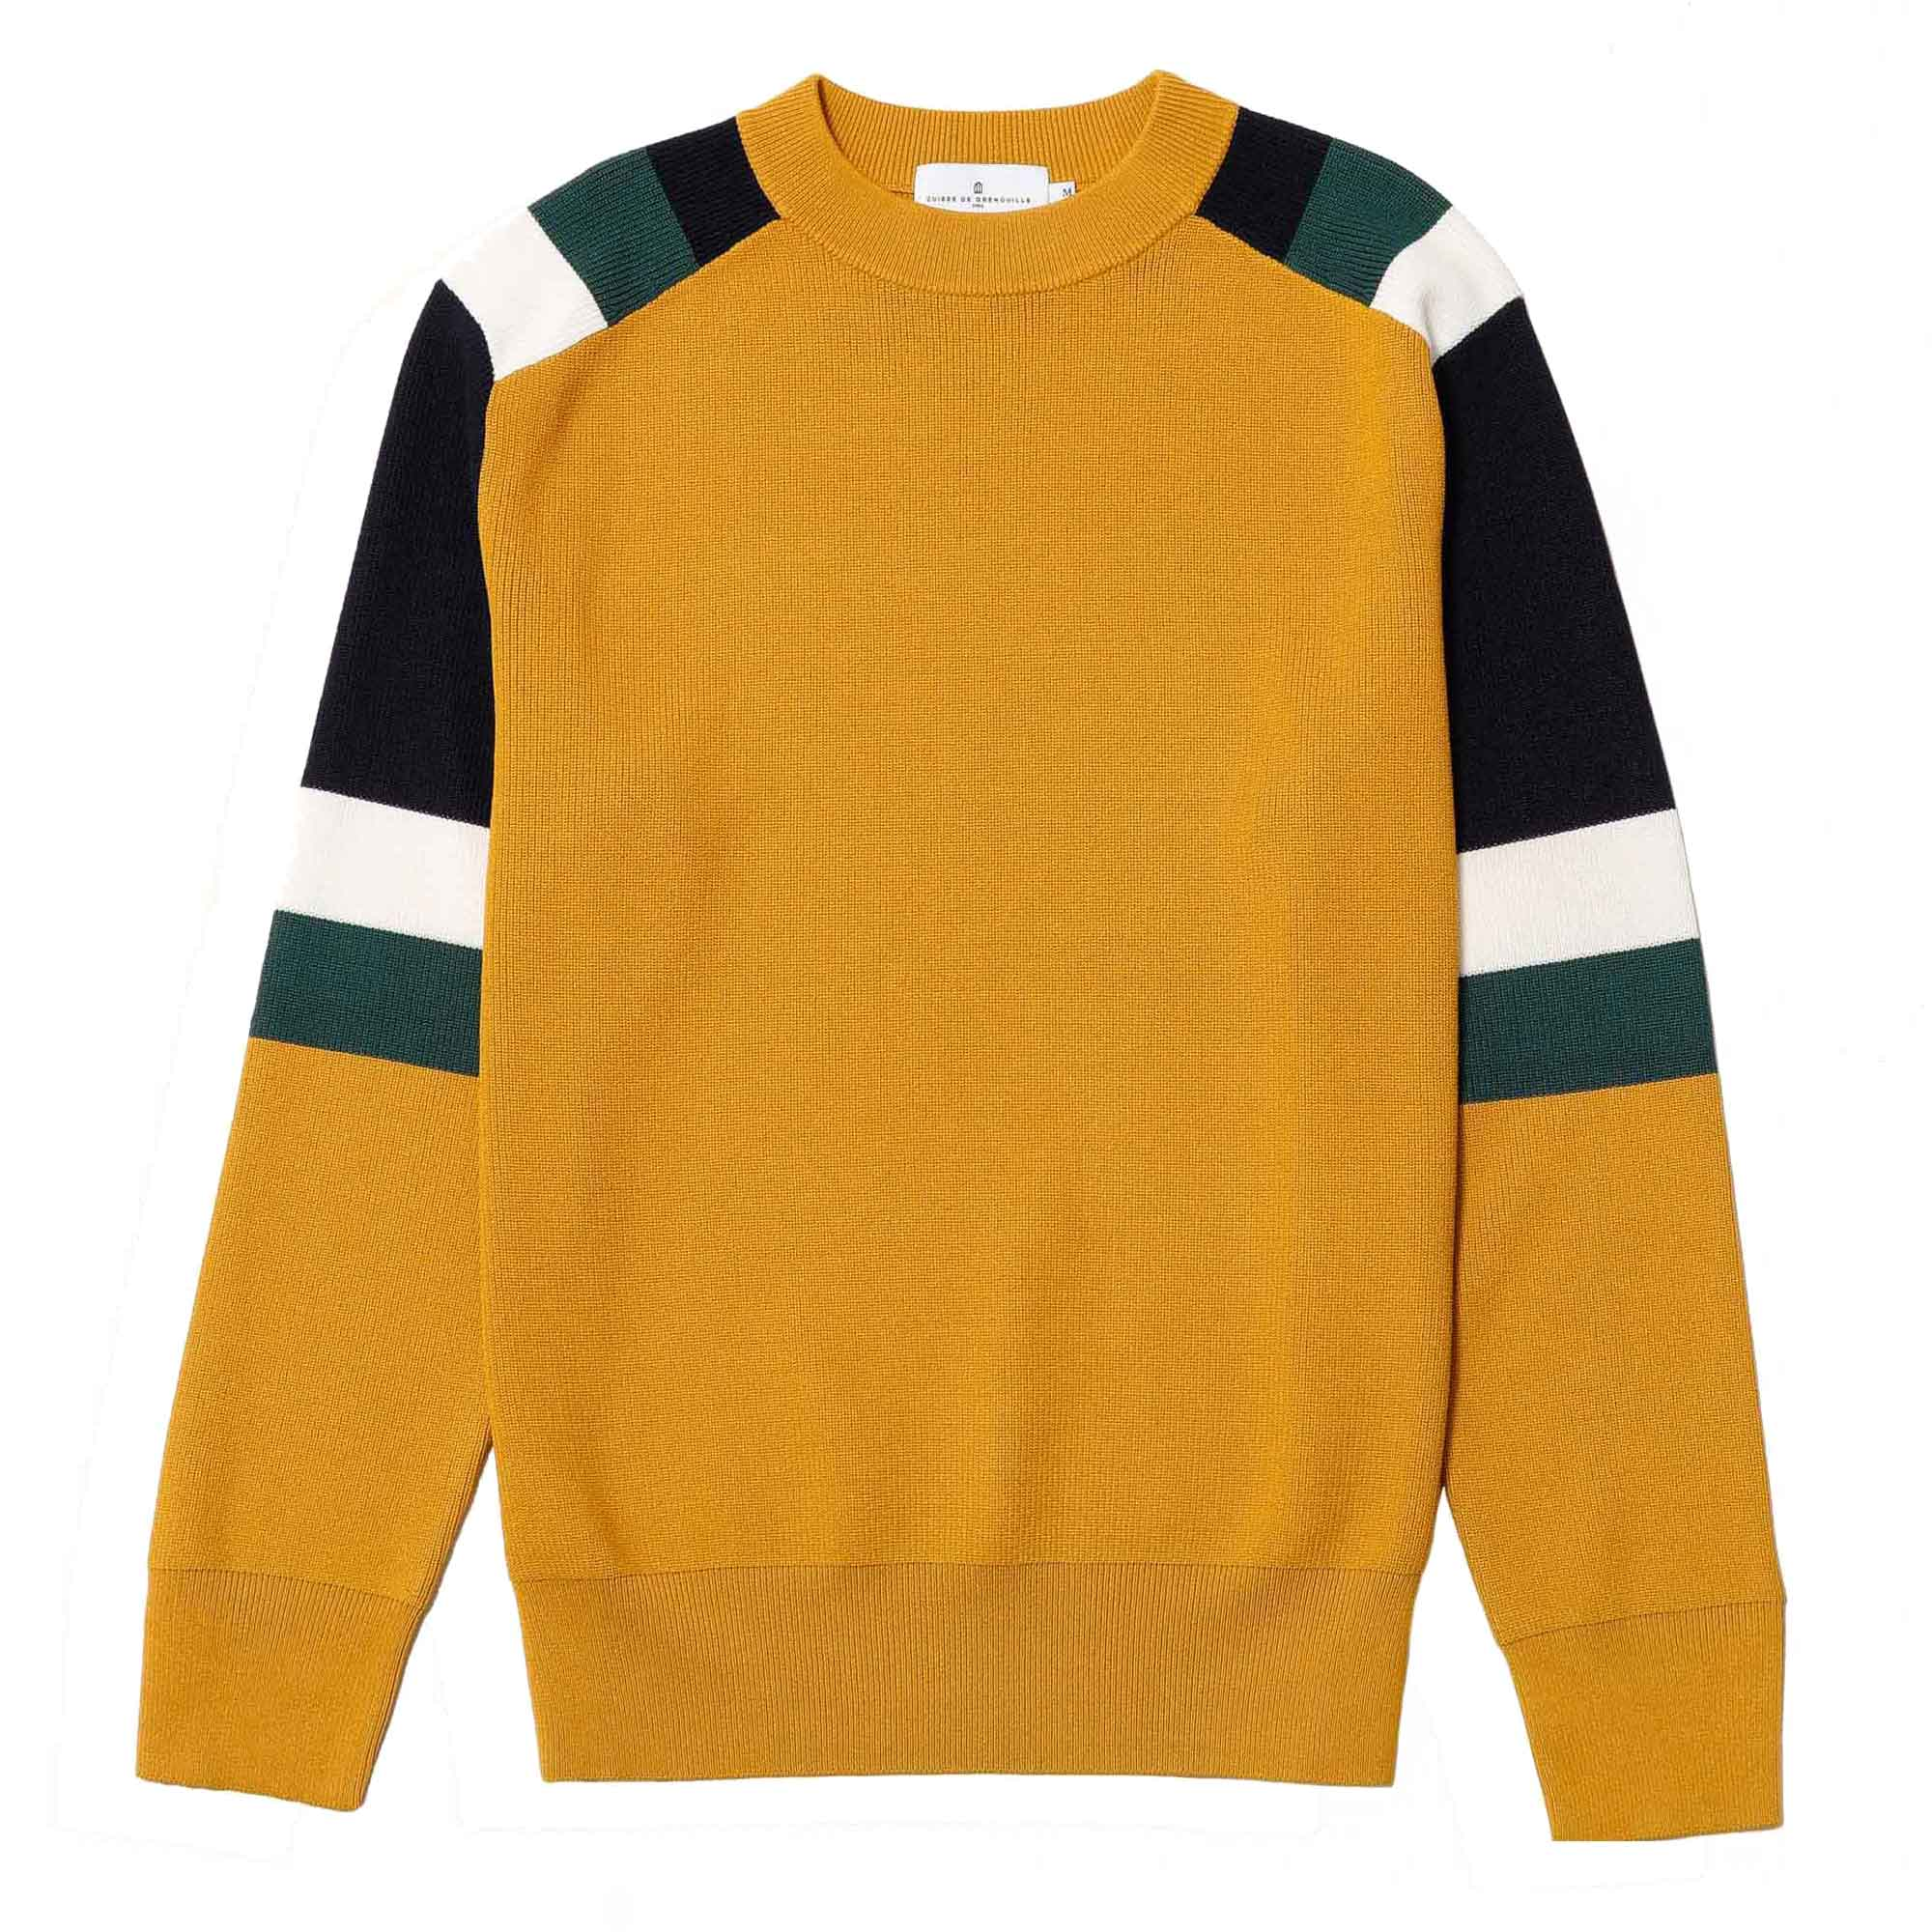 Suéter tricolor mostaza